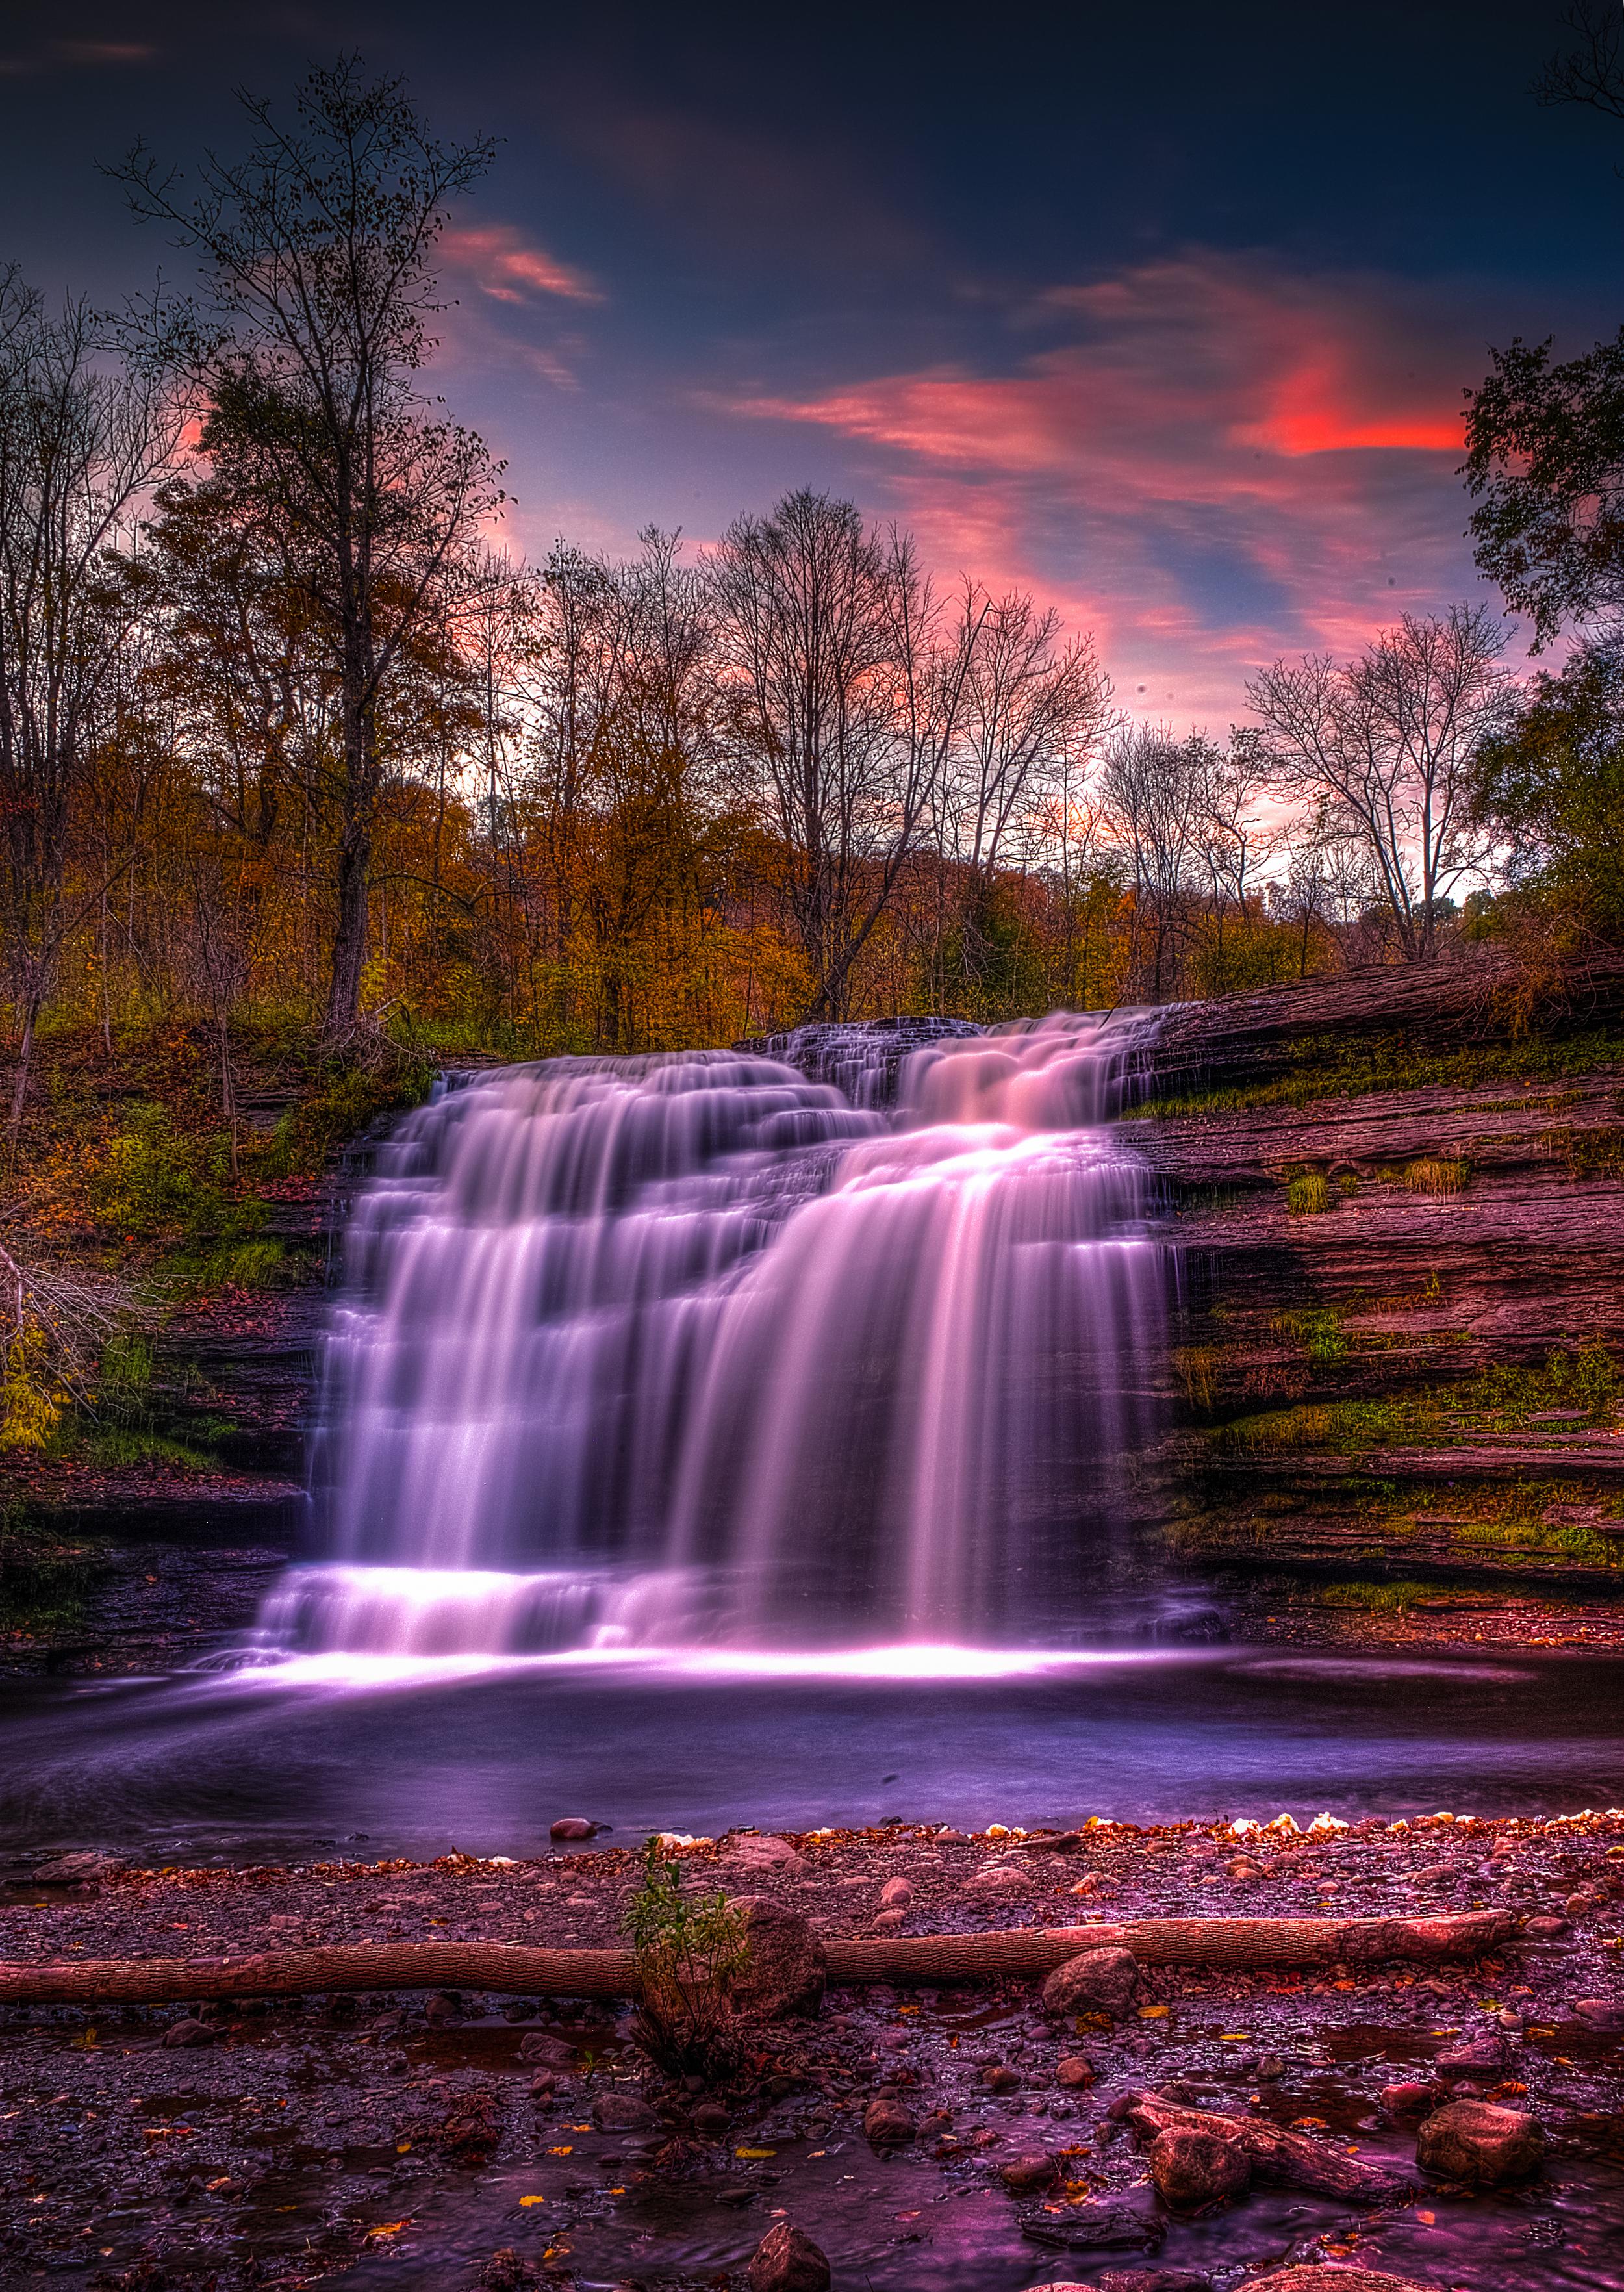 Pixley Falls by Matt Ossowski